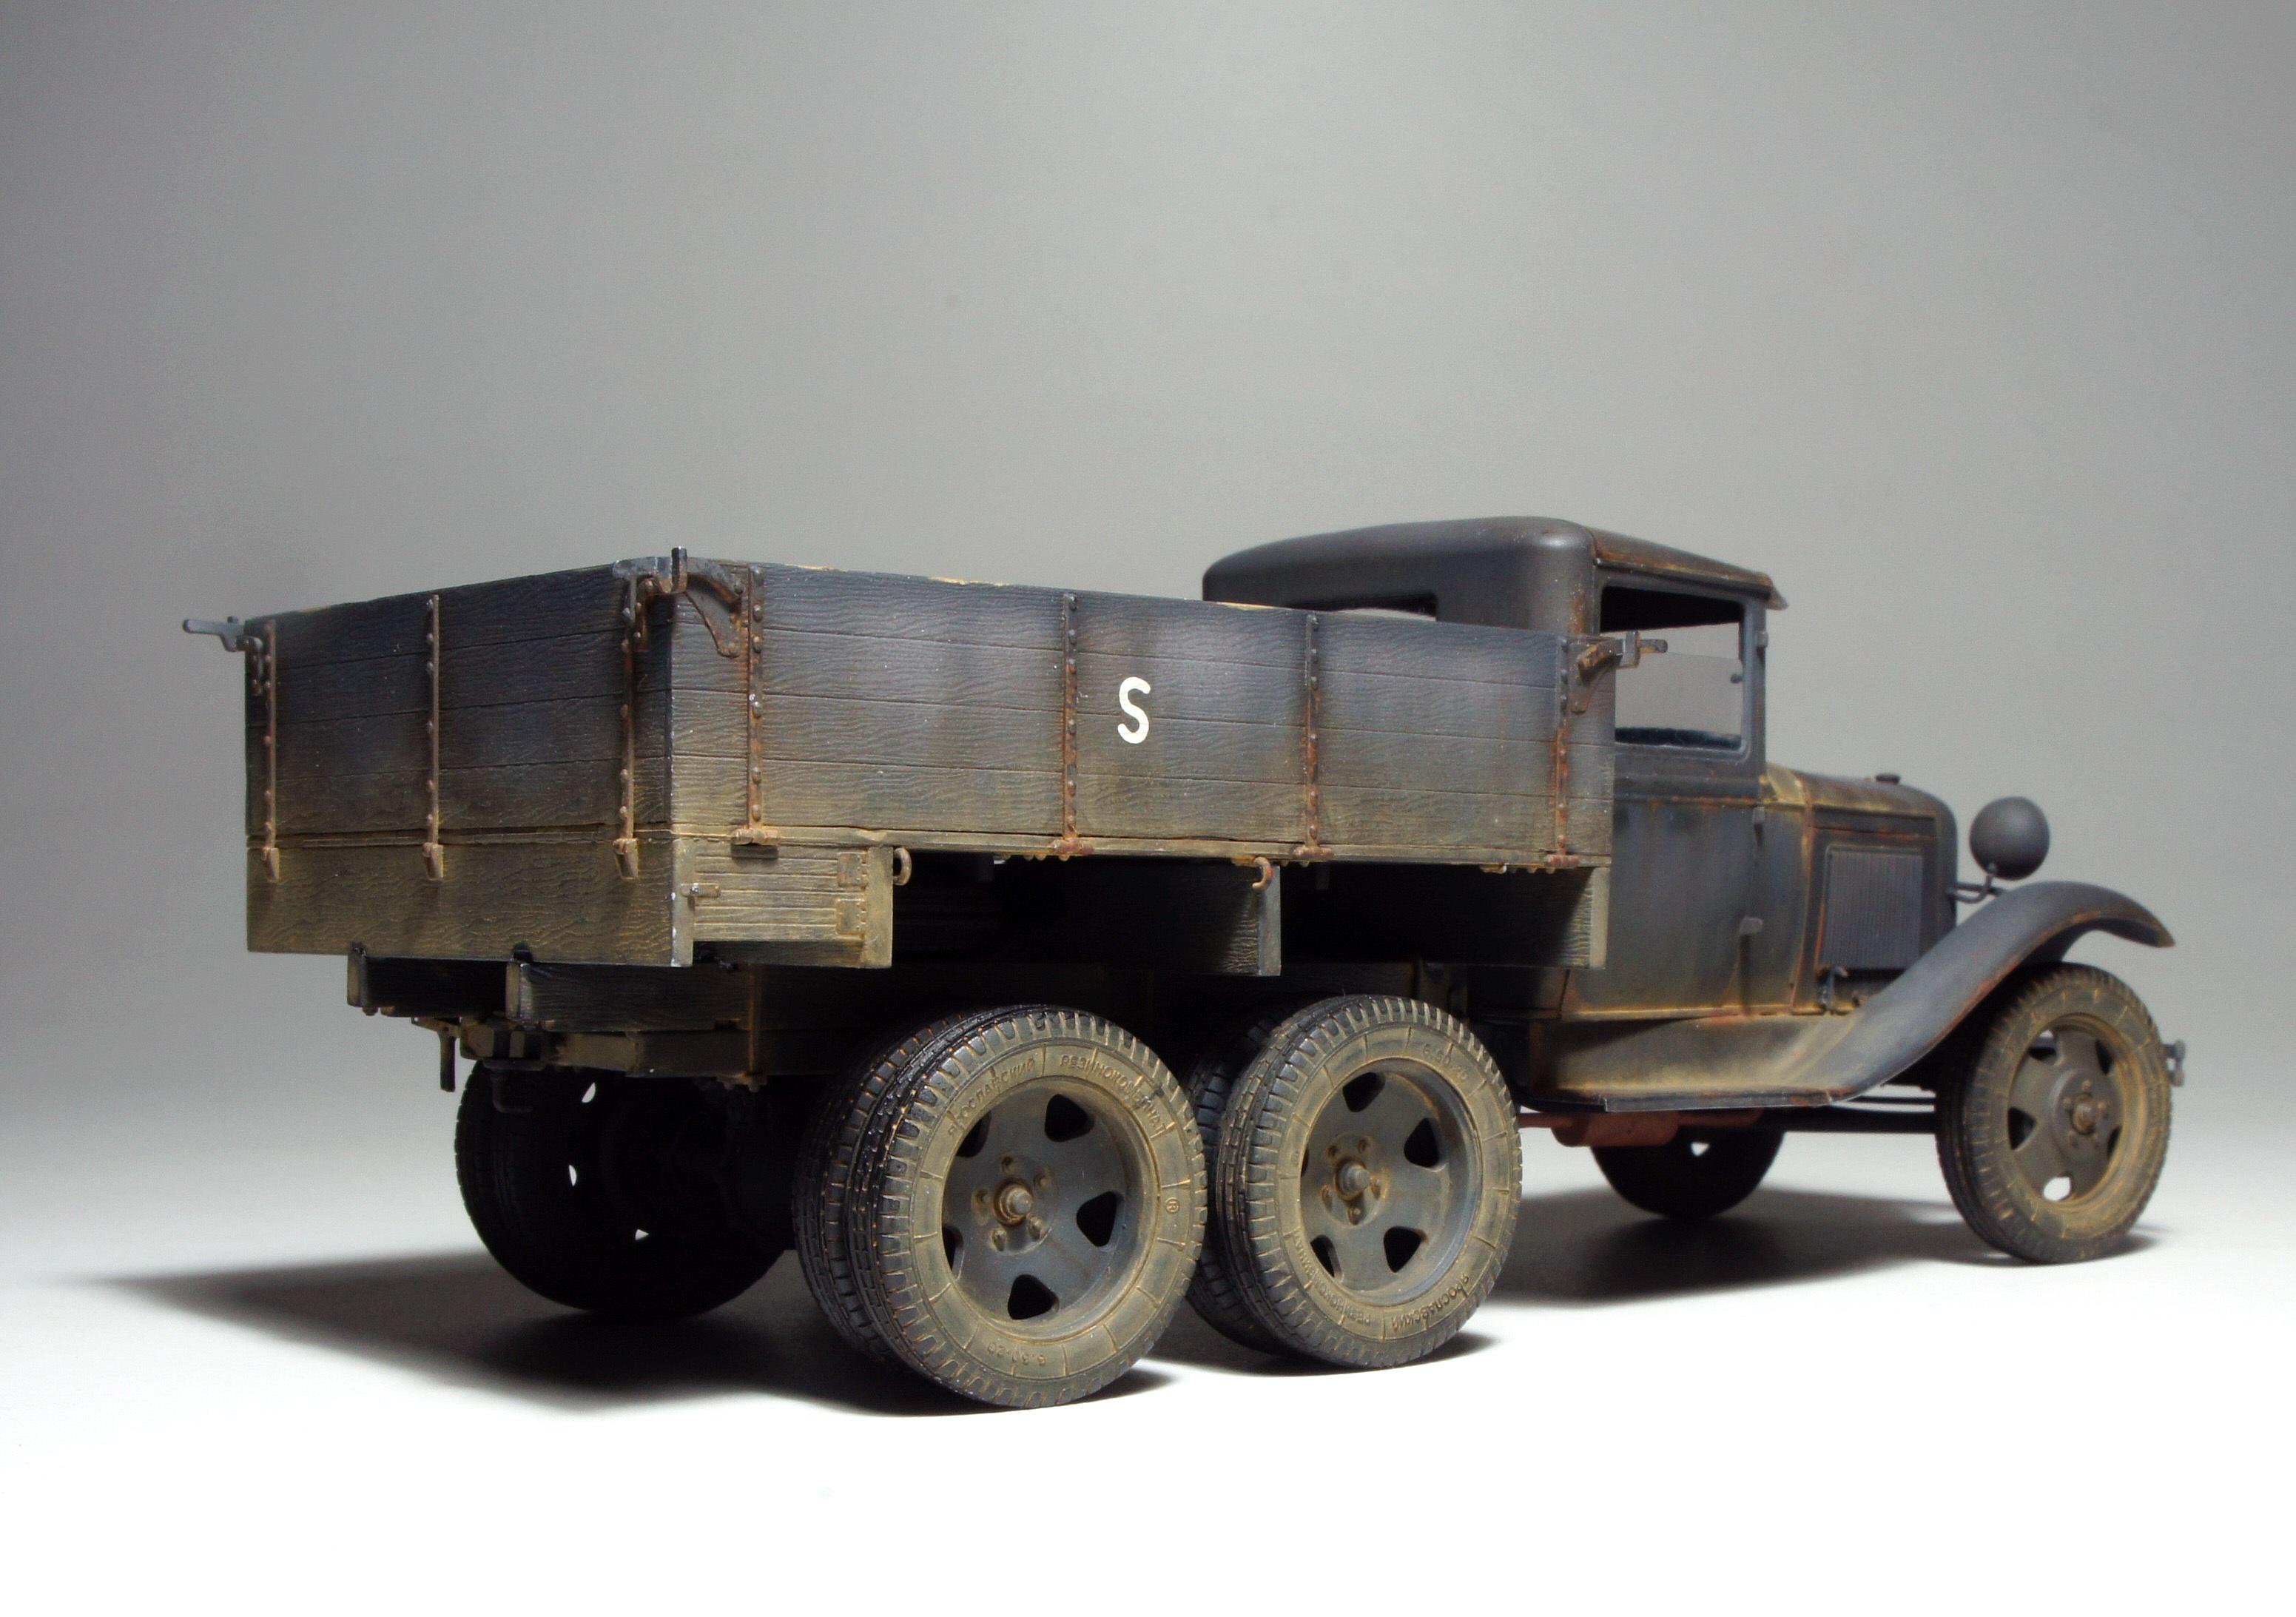 Free Images : retro, tea, old, truck, model car, world war ii ...